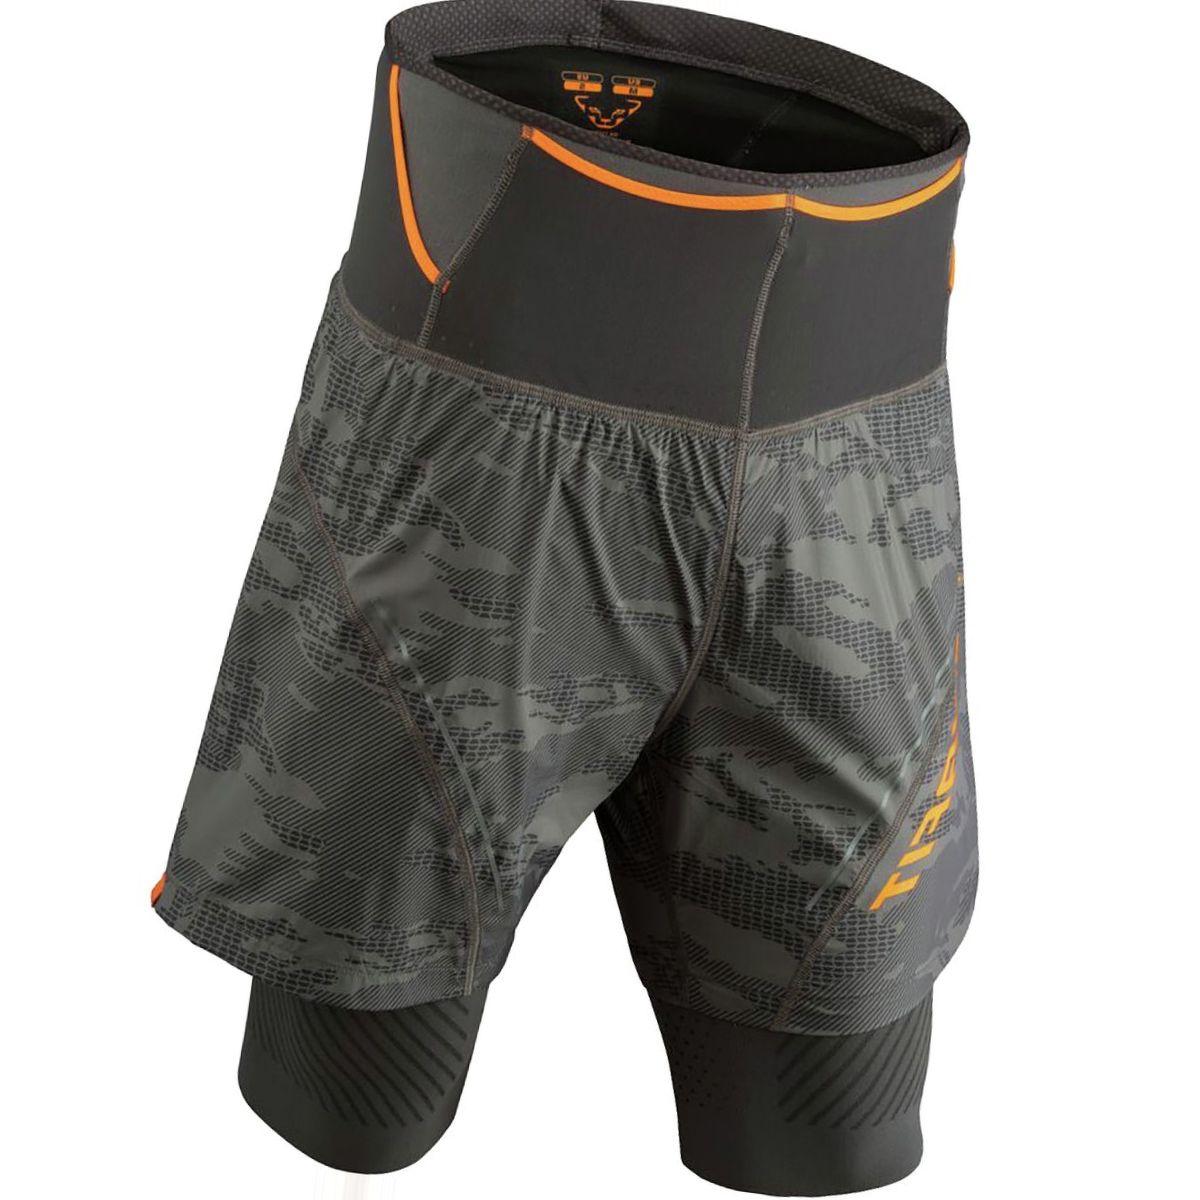 Dynafit Glockner Ultra 2in1 Short - Men's